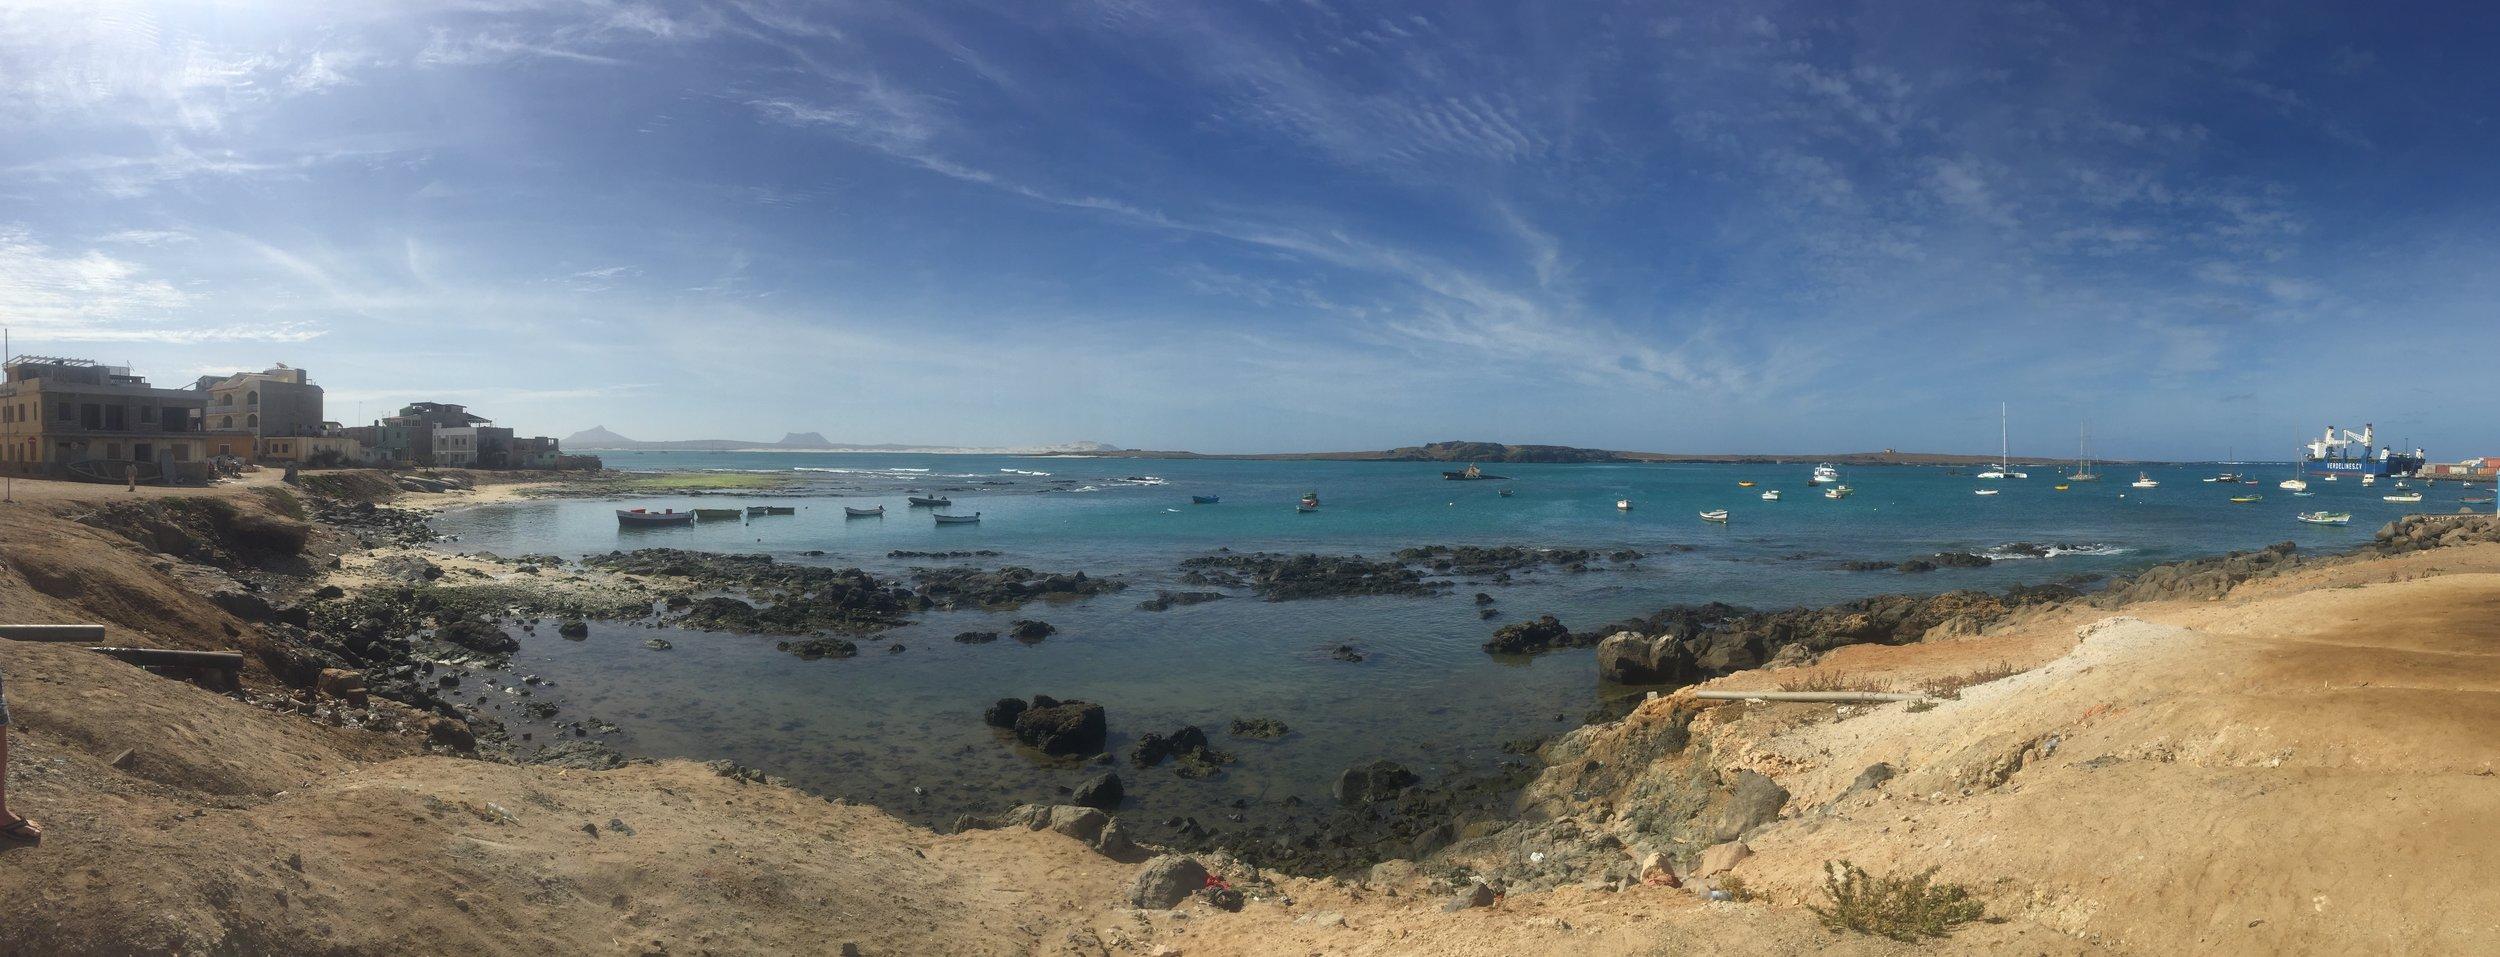 Sal Re (Boa Vista's Capital City),Harbour